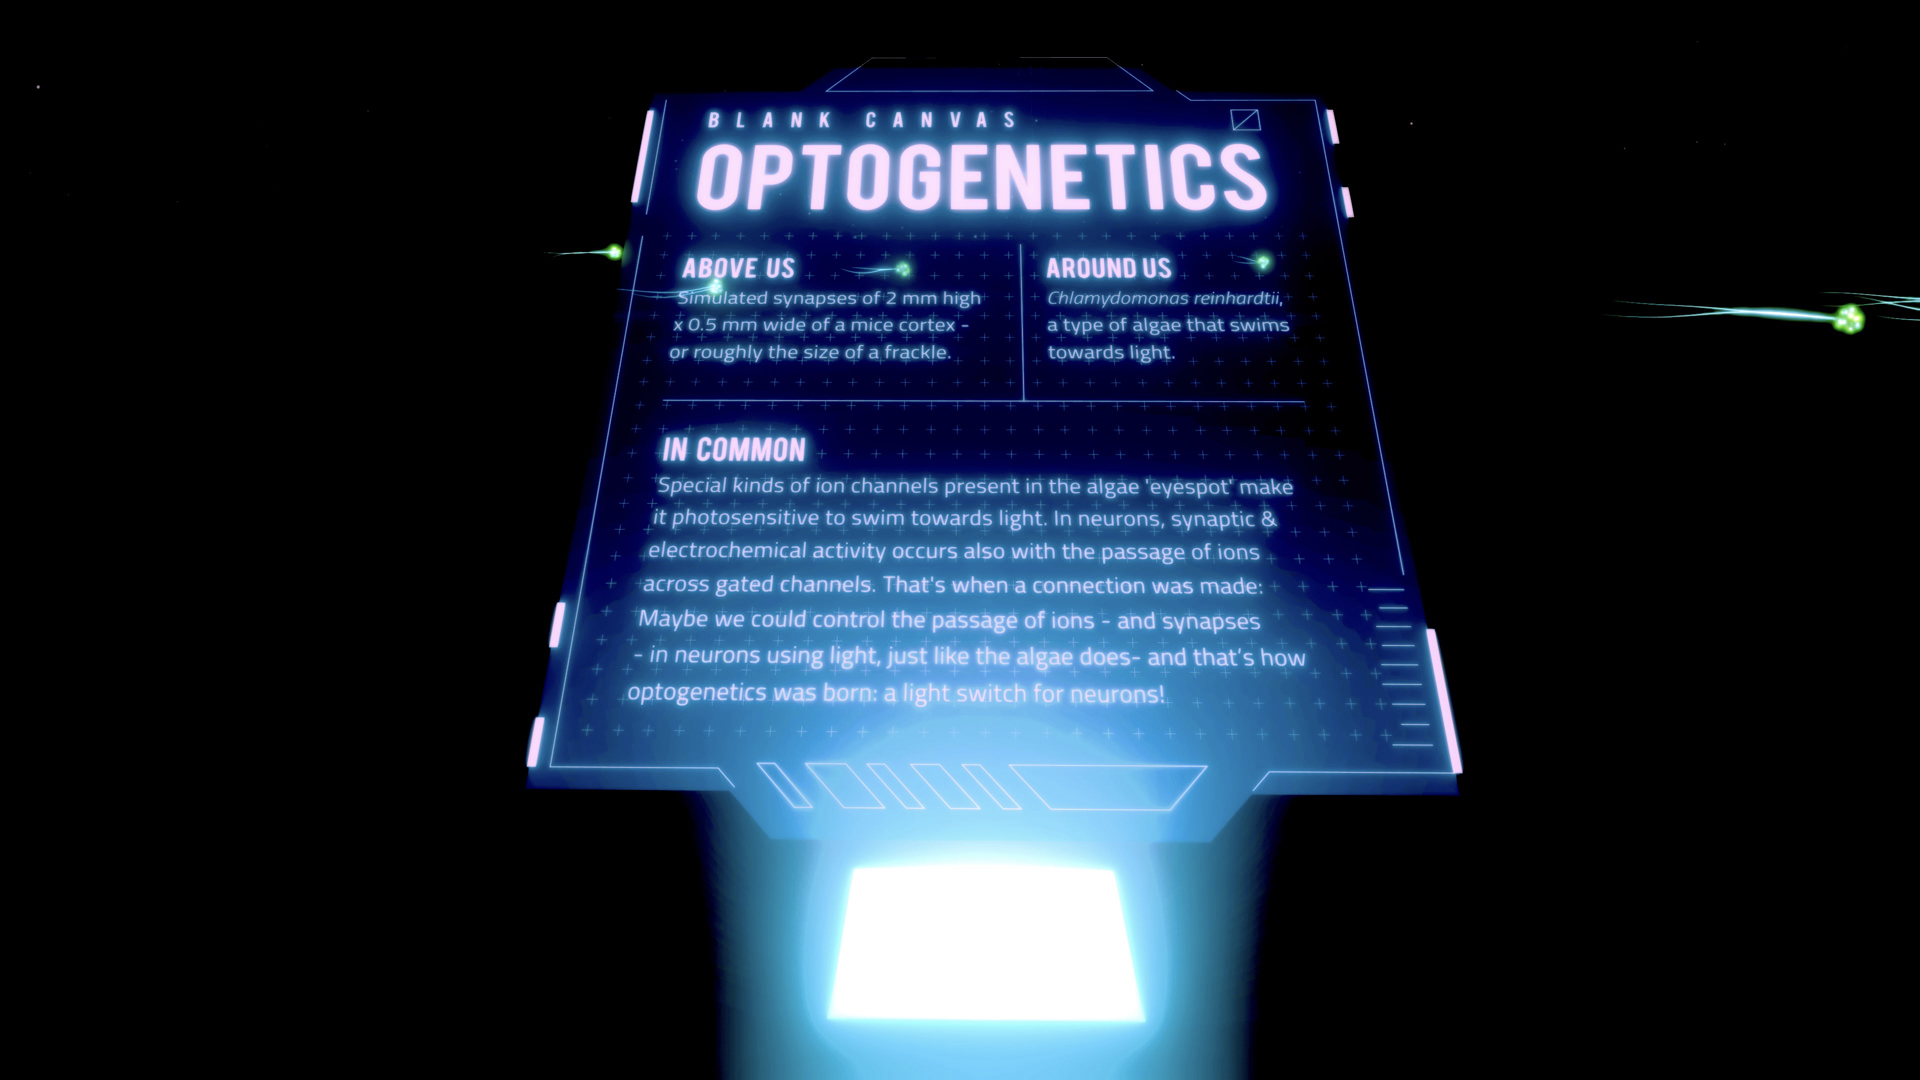 Blank Canvas: Optogenetics